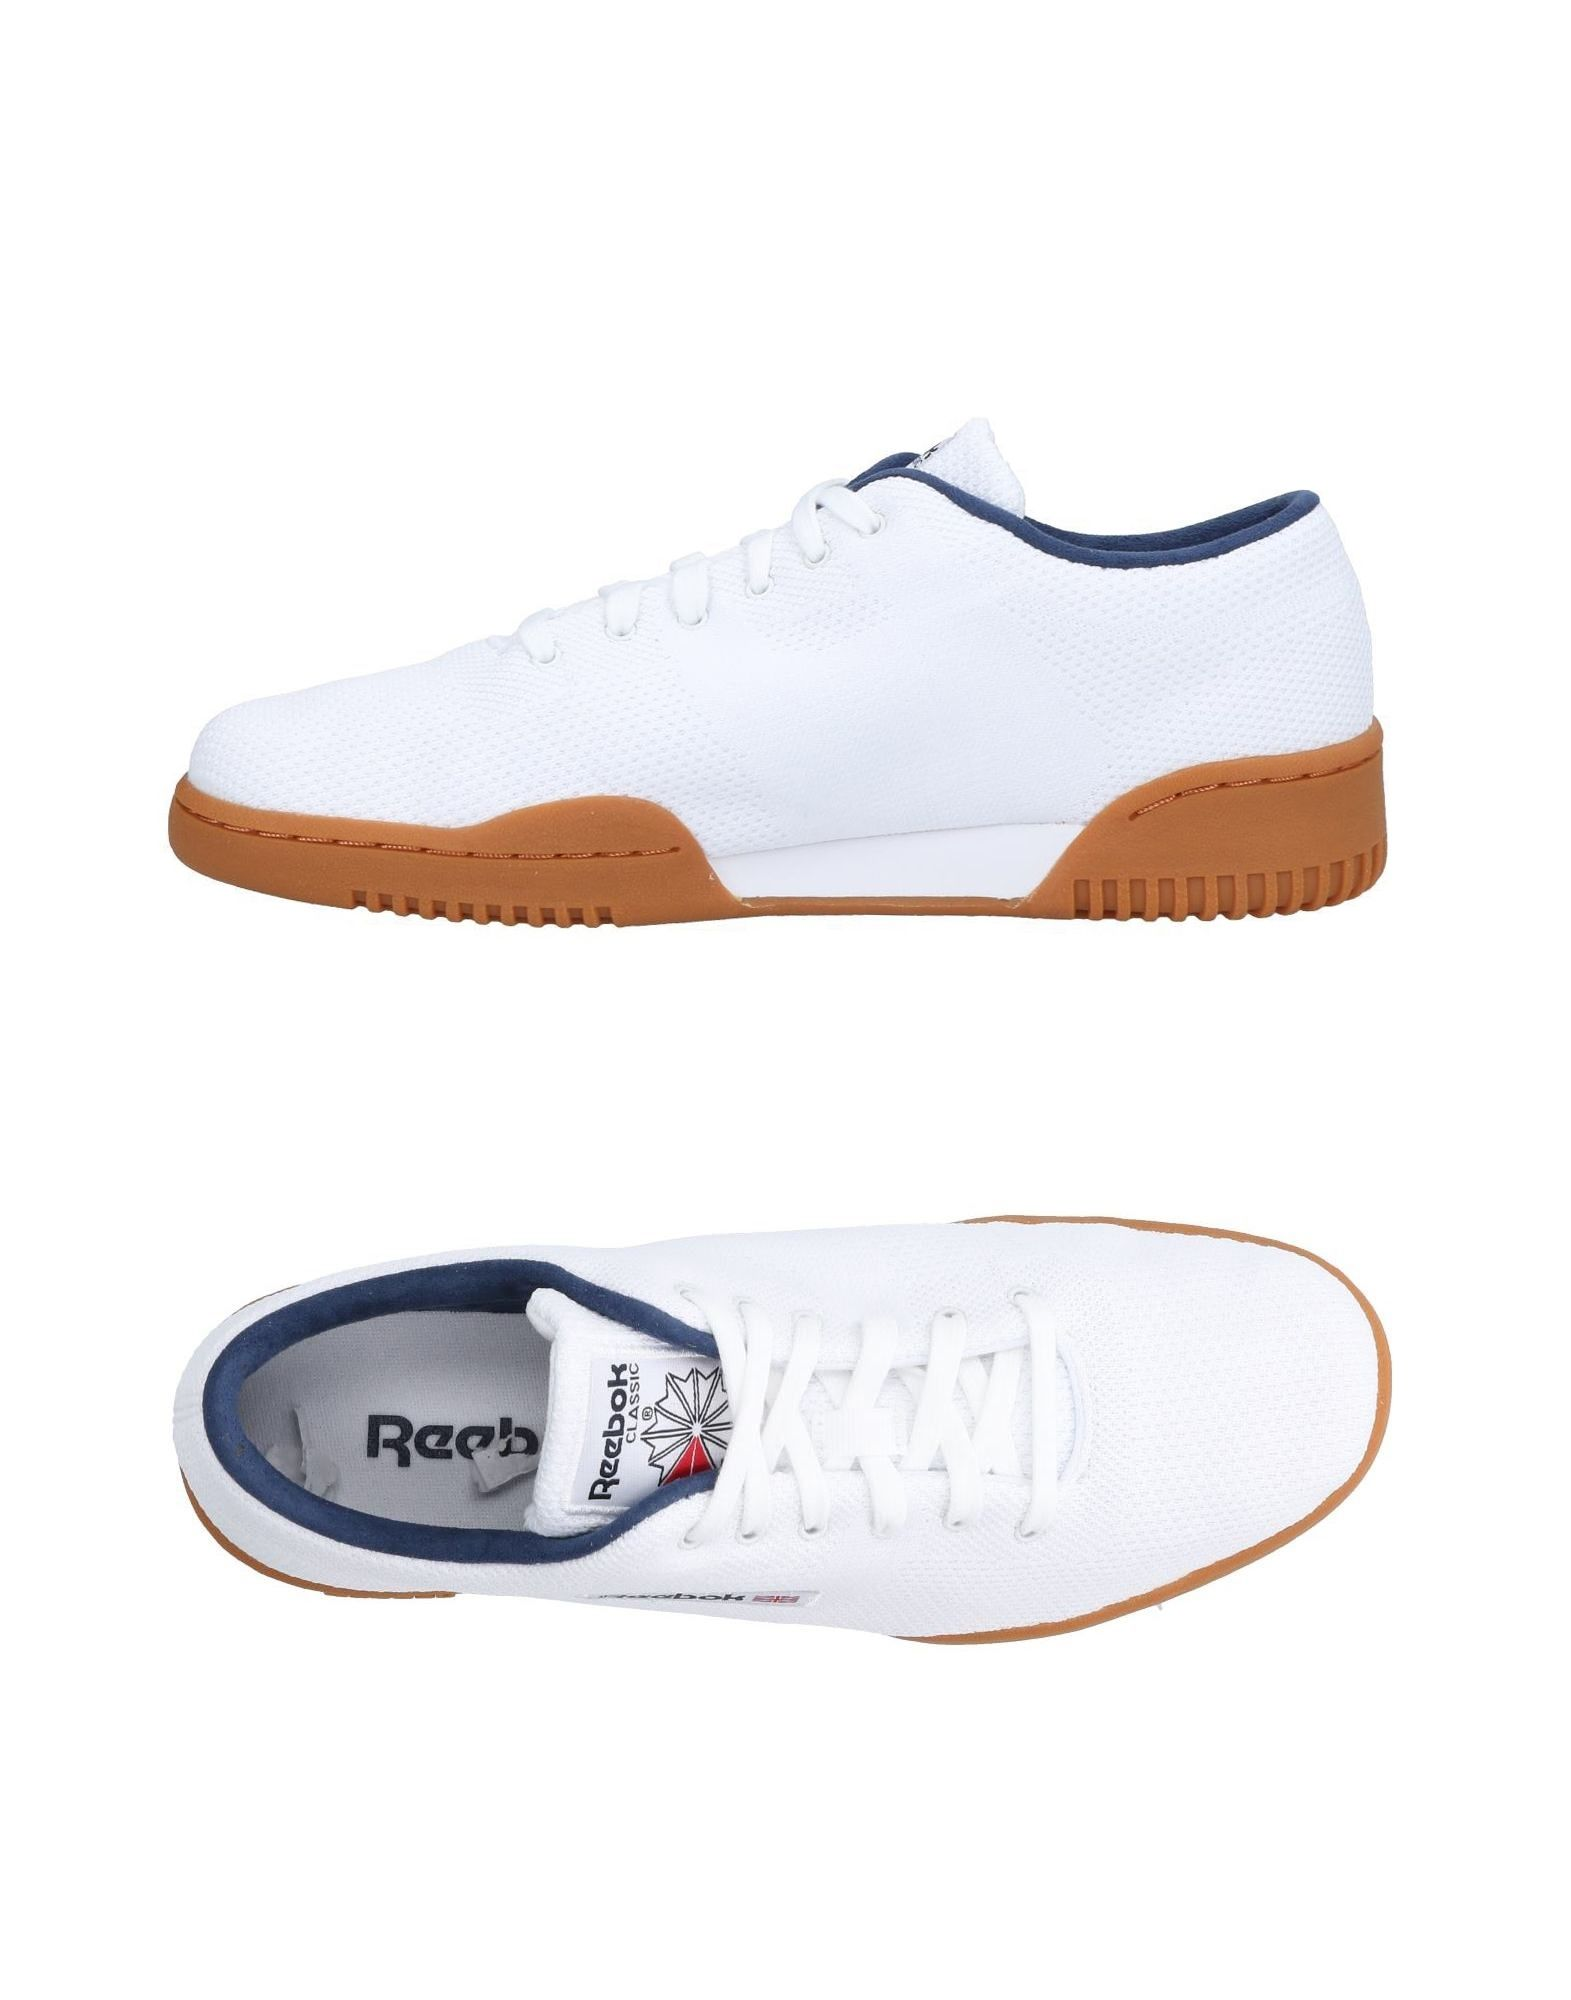 Rabatt echte Schuhe 11460210WH Reebok Sneakers Herren  11460210WH Schuhe 1228f1